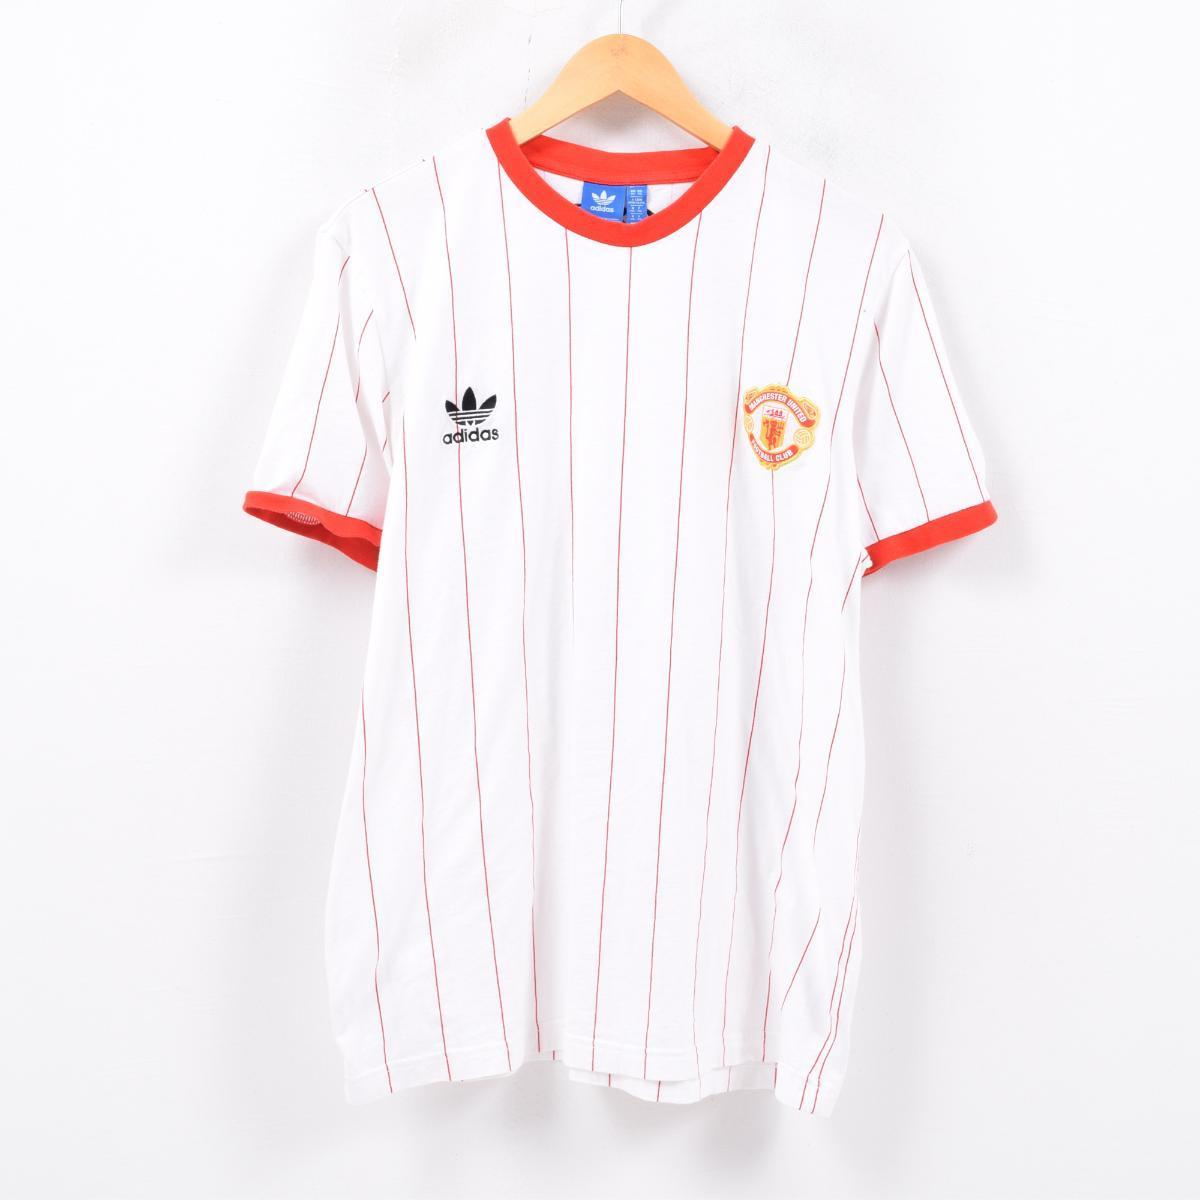 9f324318c Adidas adidas ORIGINALS originals MANCHESTER UNITED Manchester United  stripe pattern ringer T-shirt men L  wbd4035